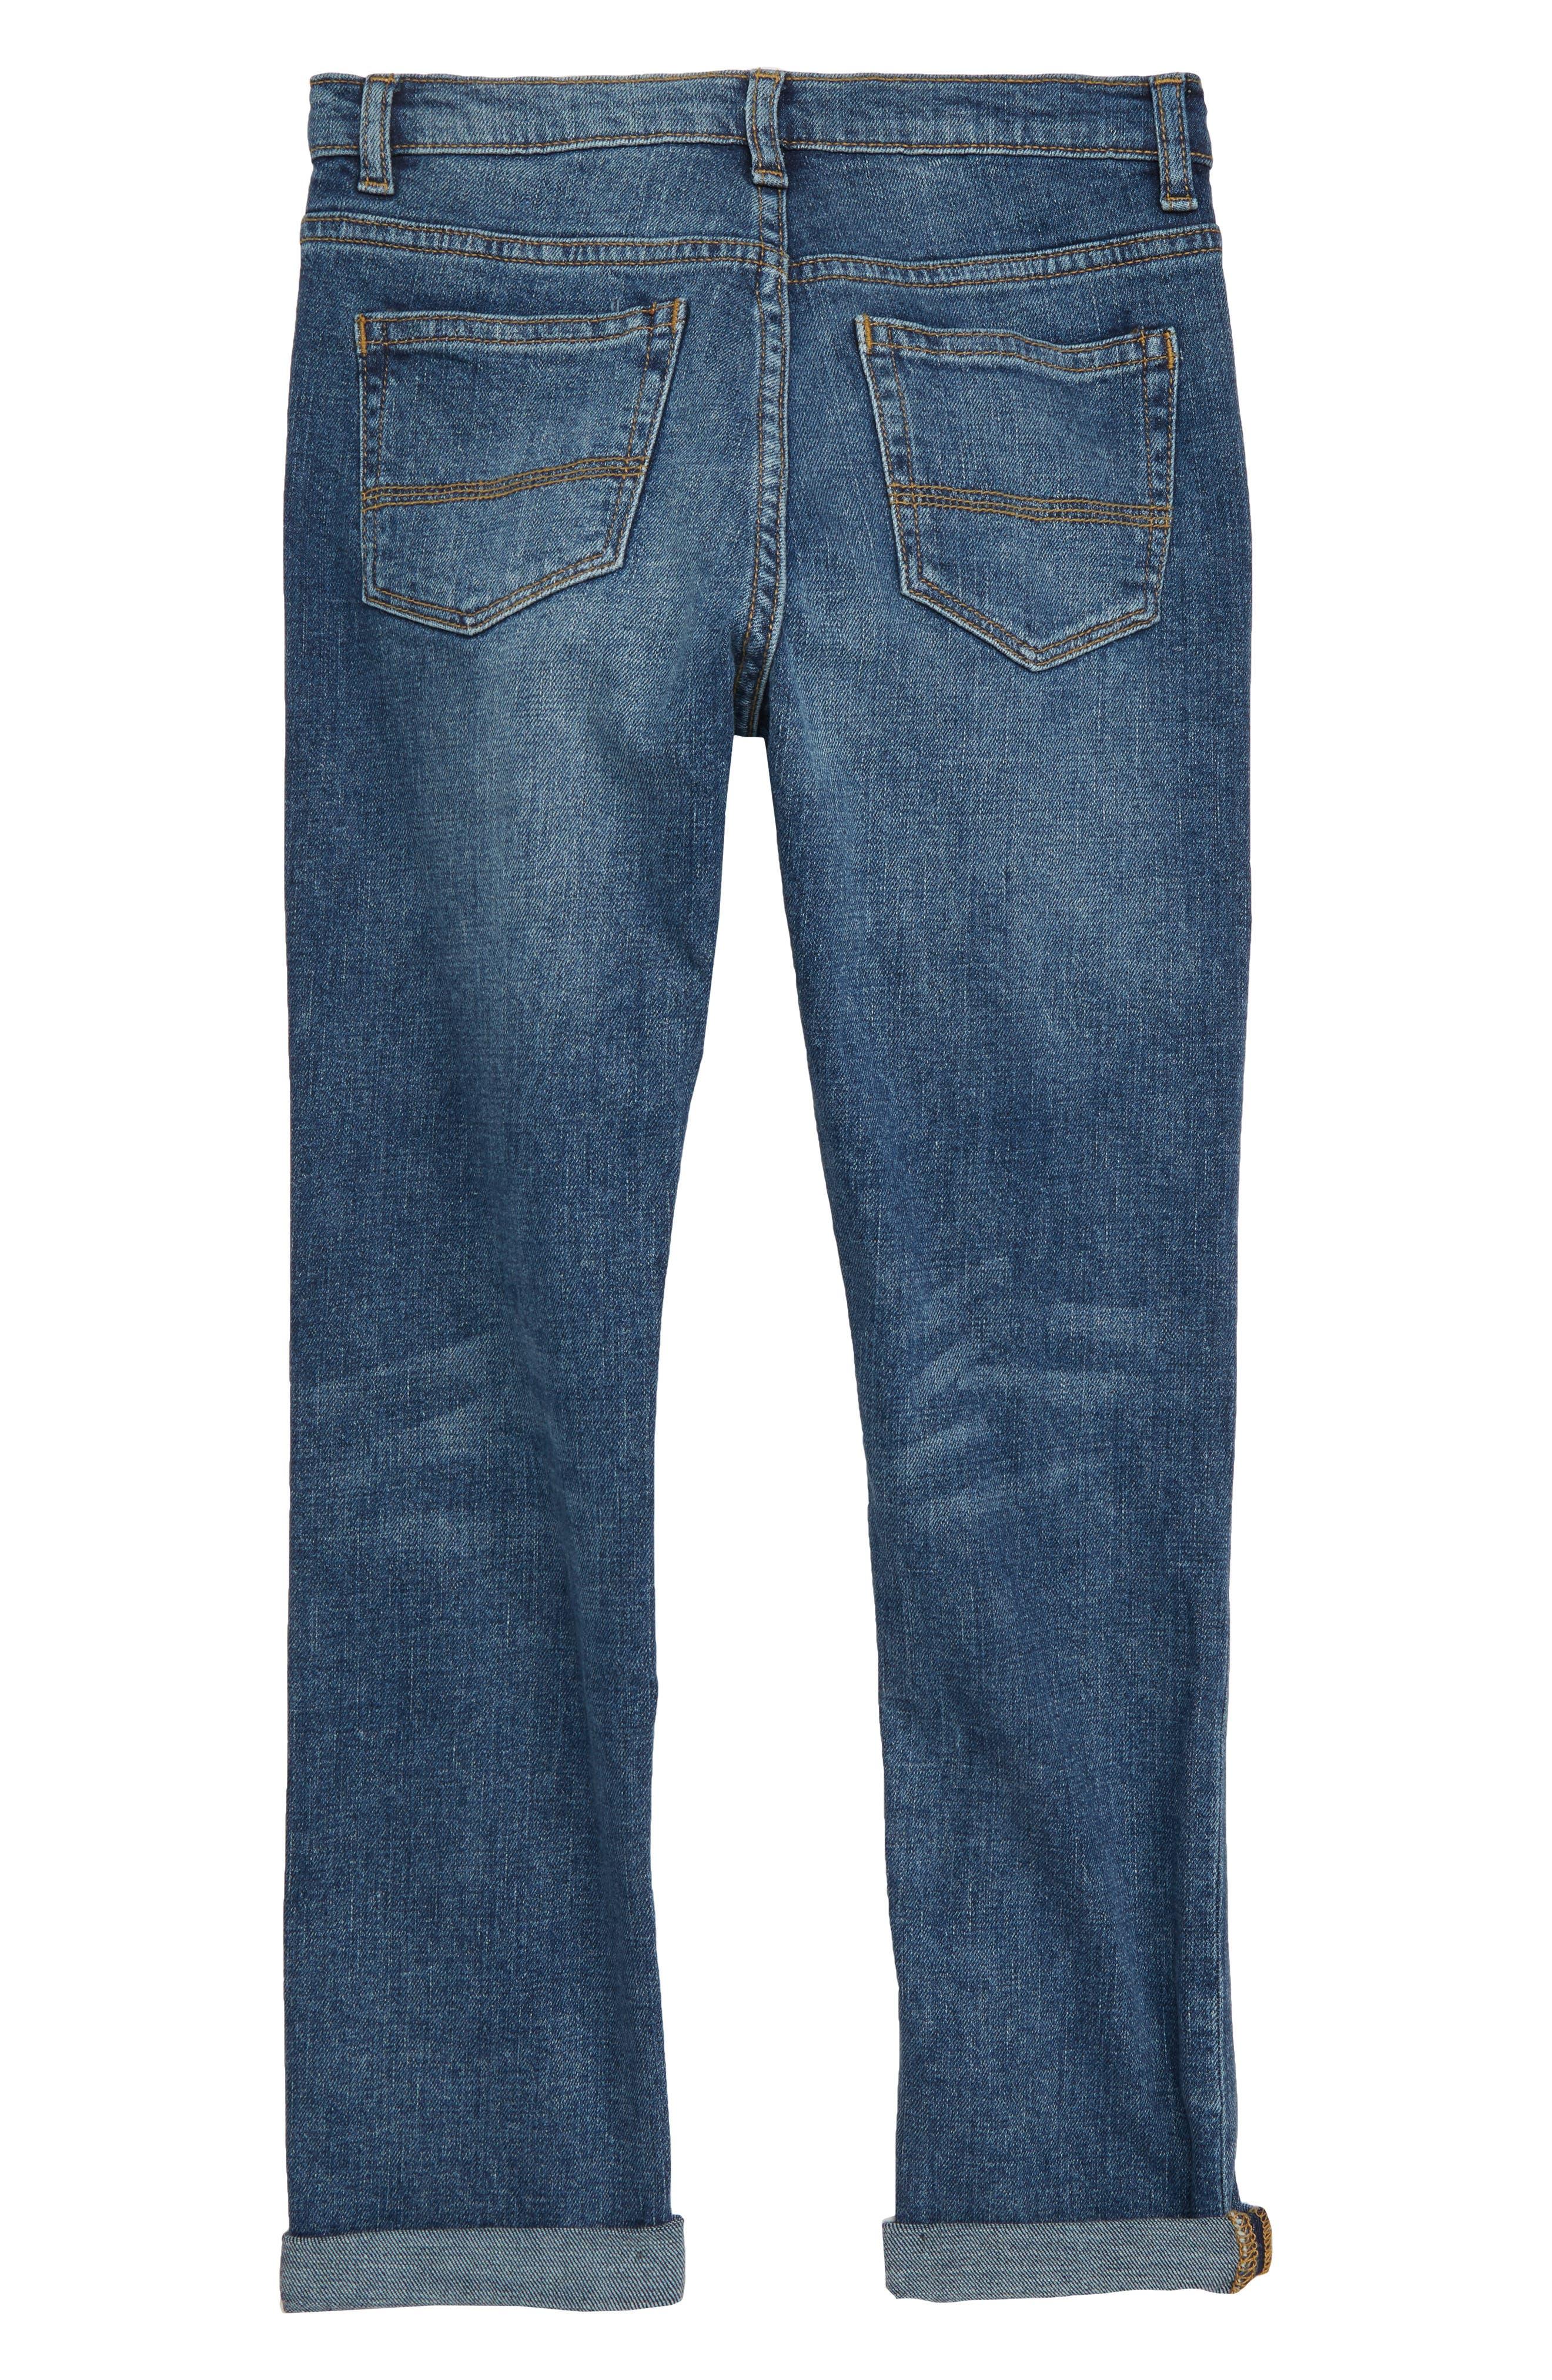 Slouch Jeans,                             Alternate thumbnail 2, color,                             MEDIUM WASH